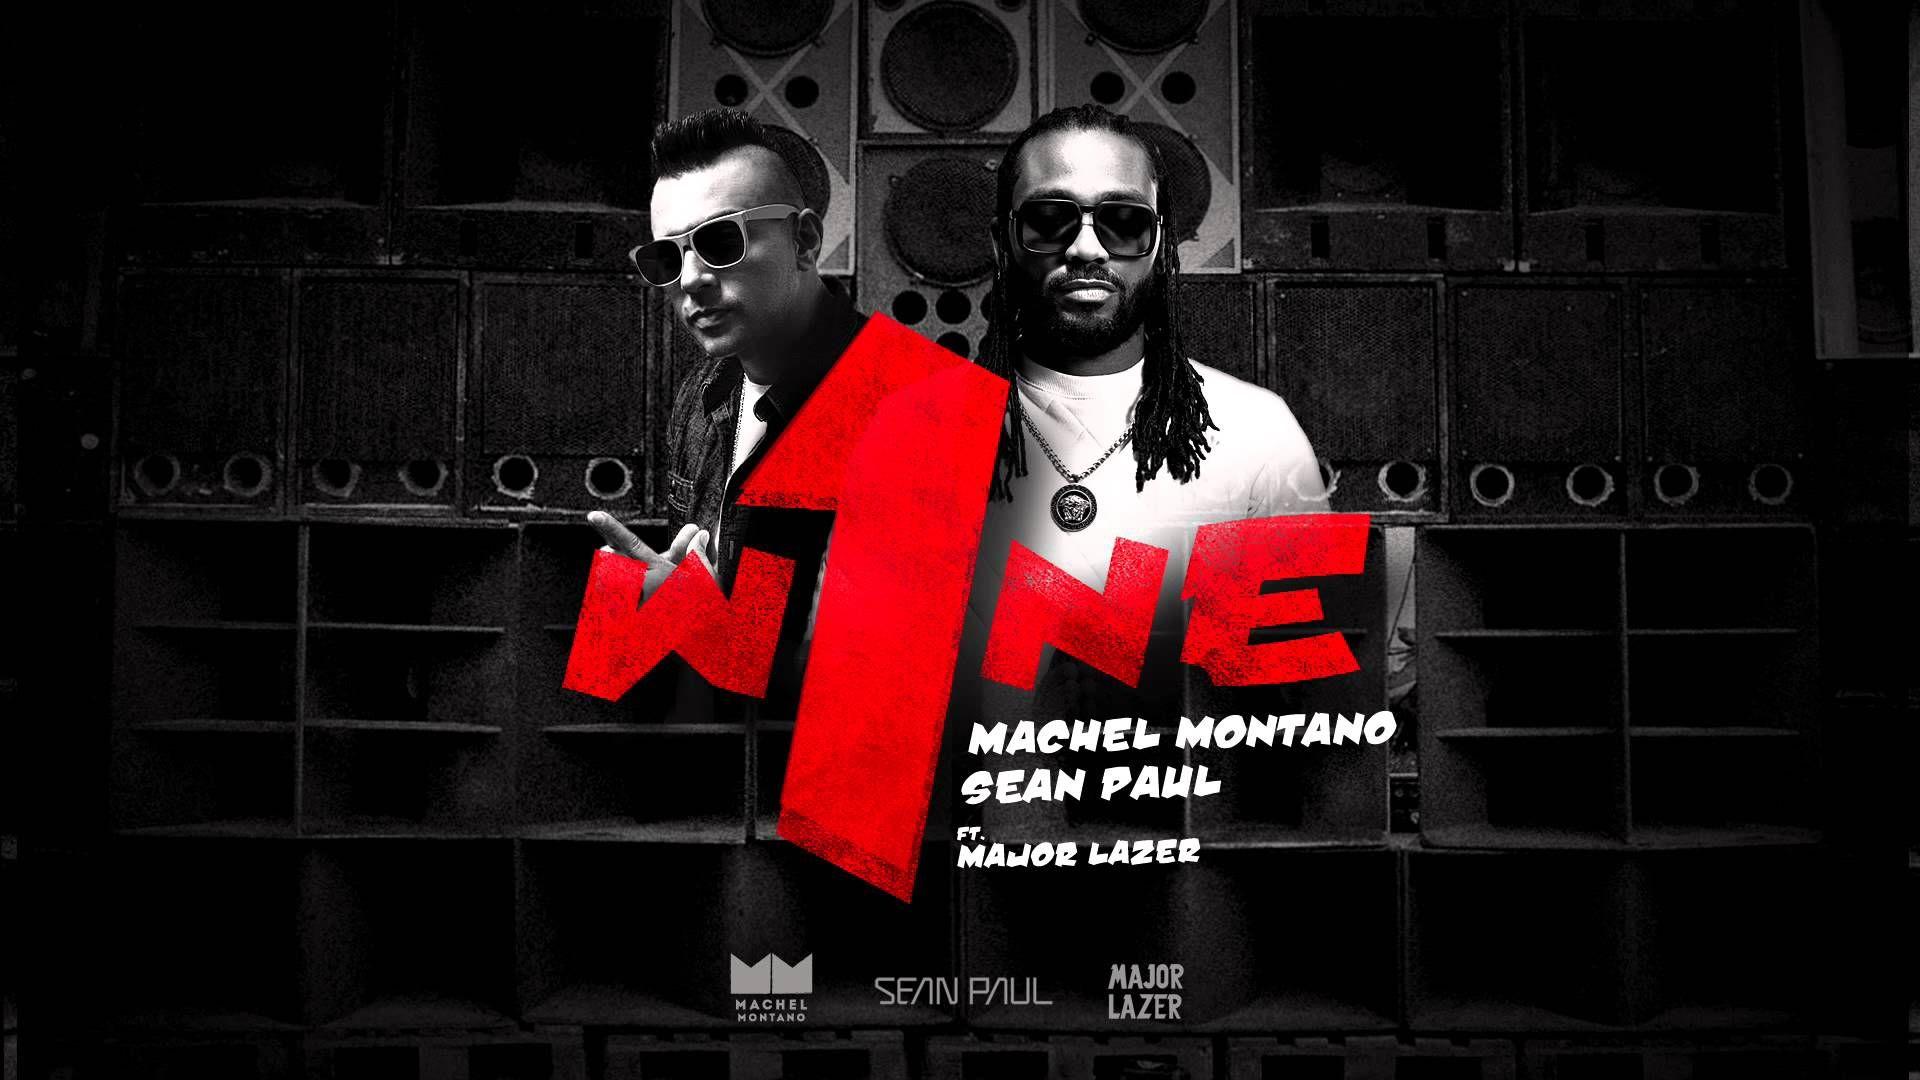 One Wine Machel Montano Sean Paul Ft Major Lazer Soca 2015 Youtube Sean Paul Machel Montano Major Lazer